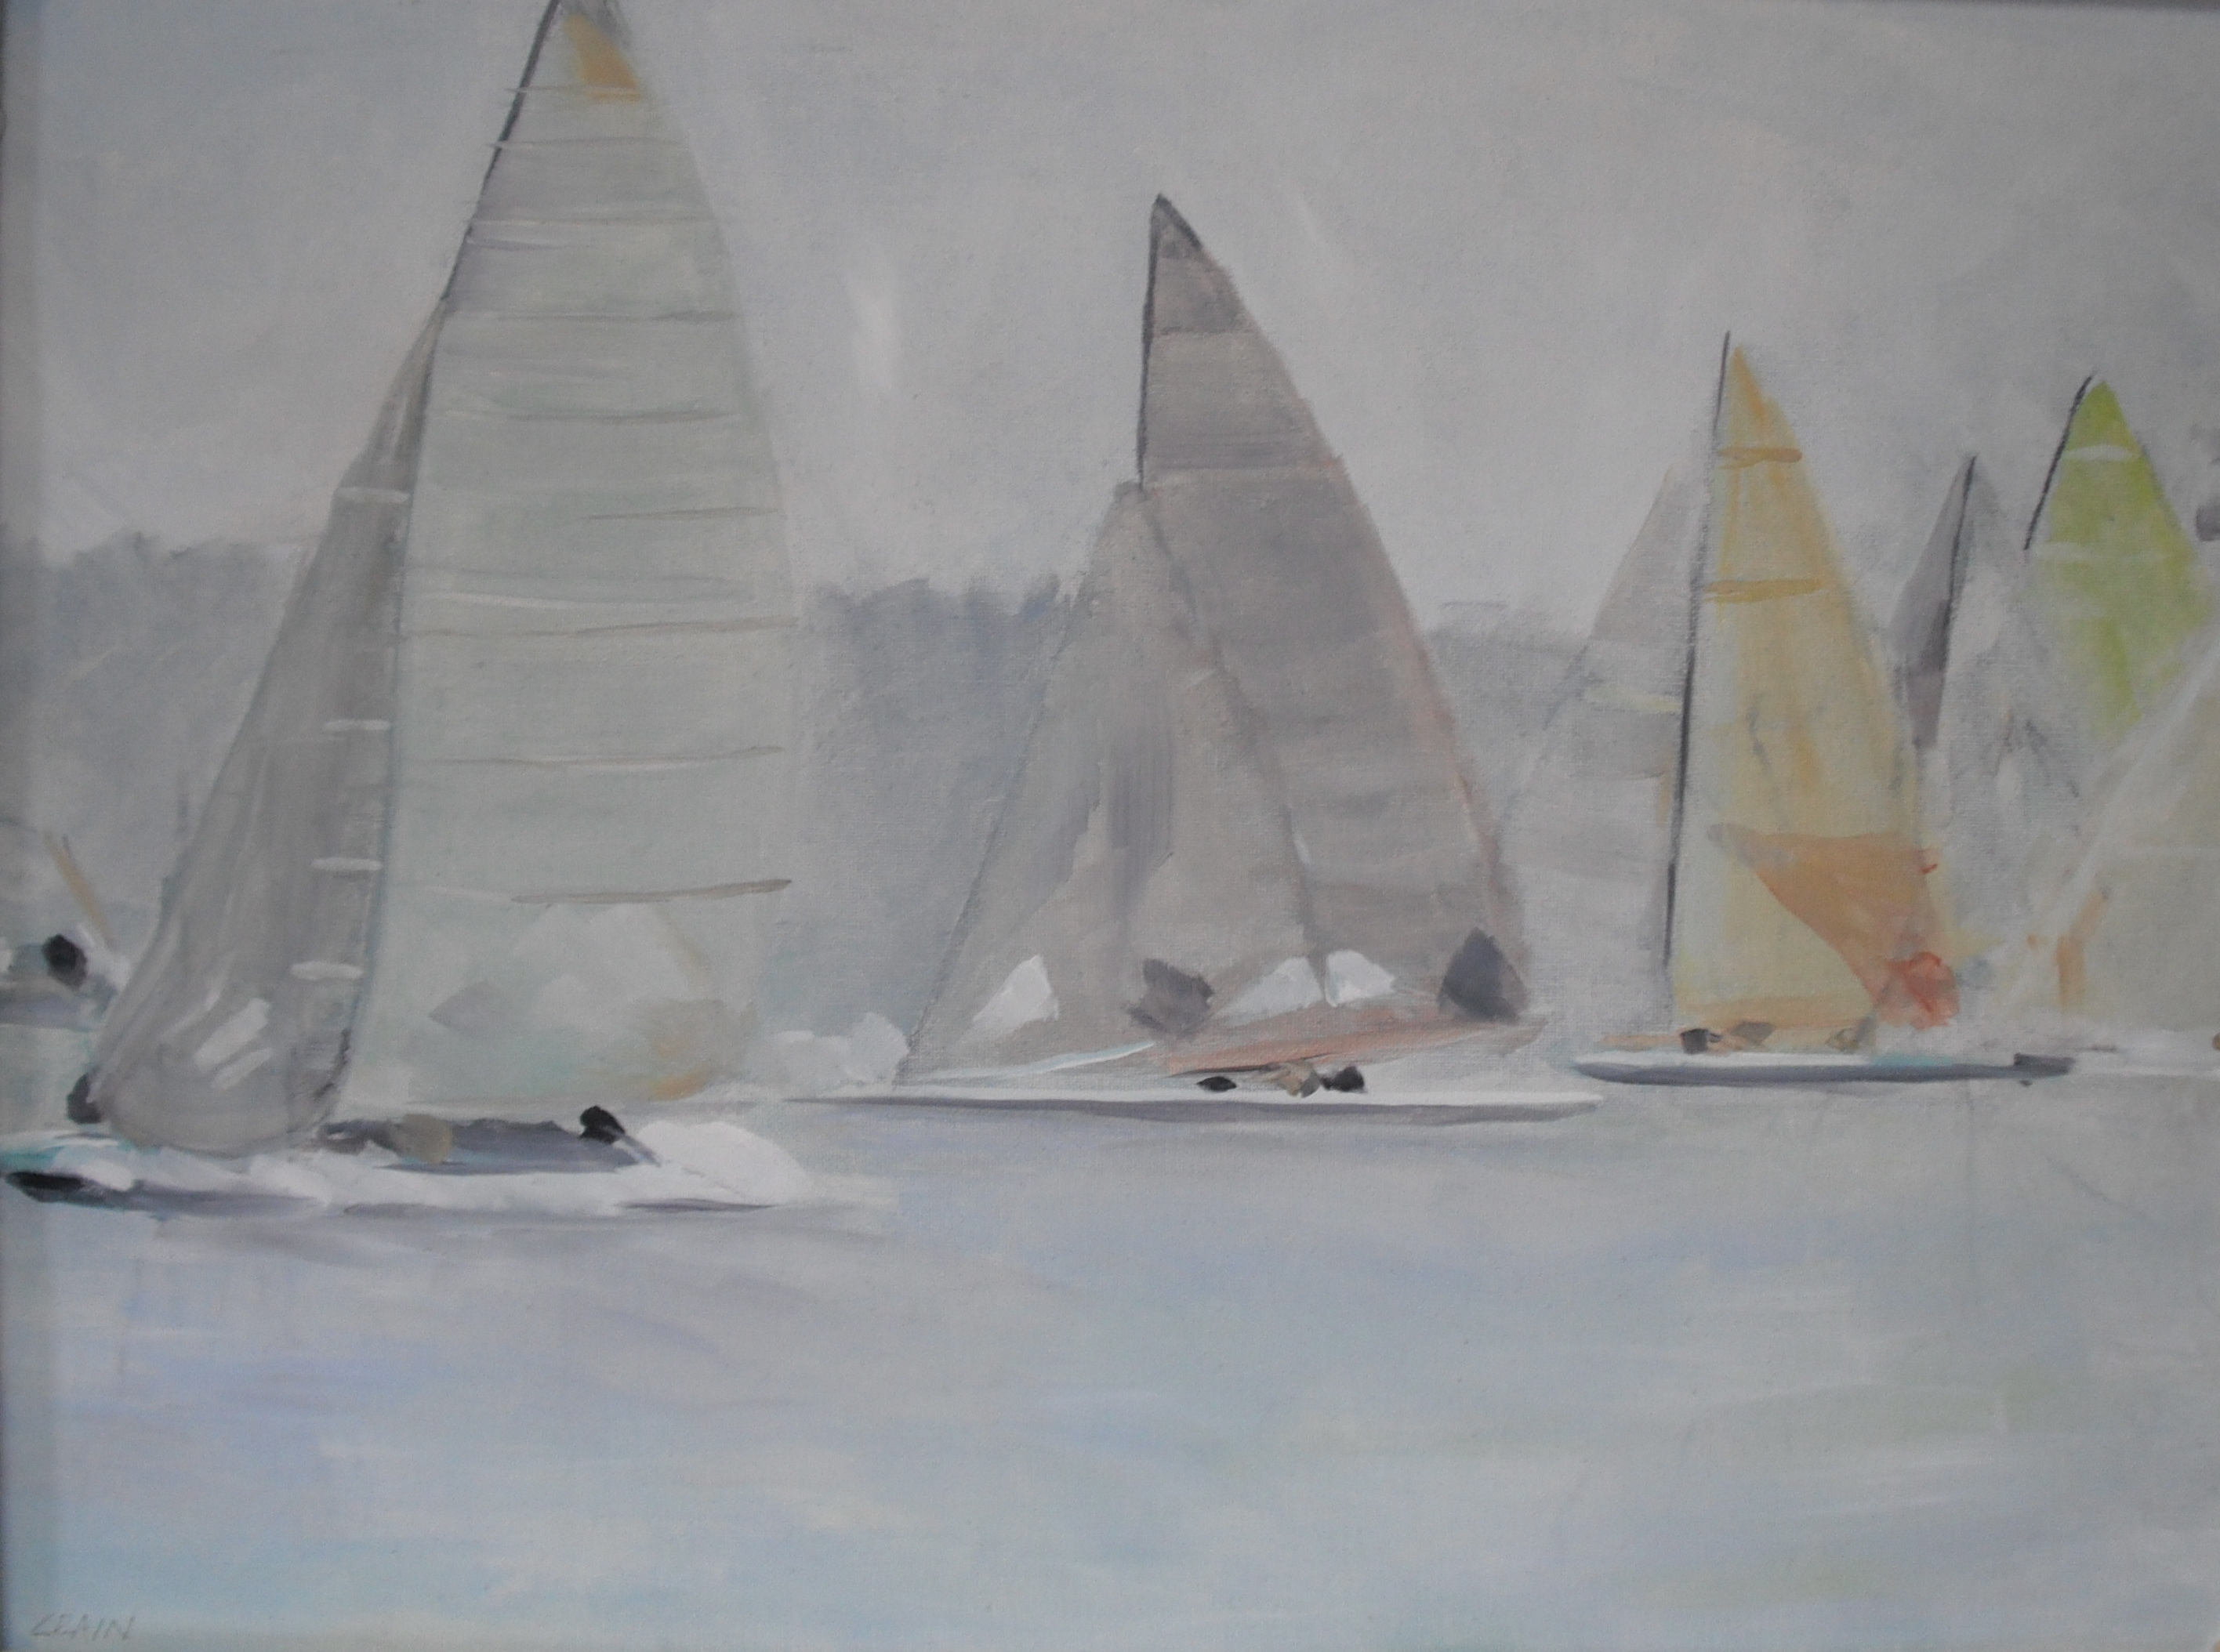 A boats on Pewaukee lake_3_3